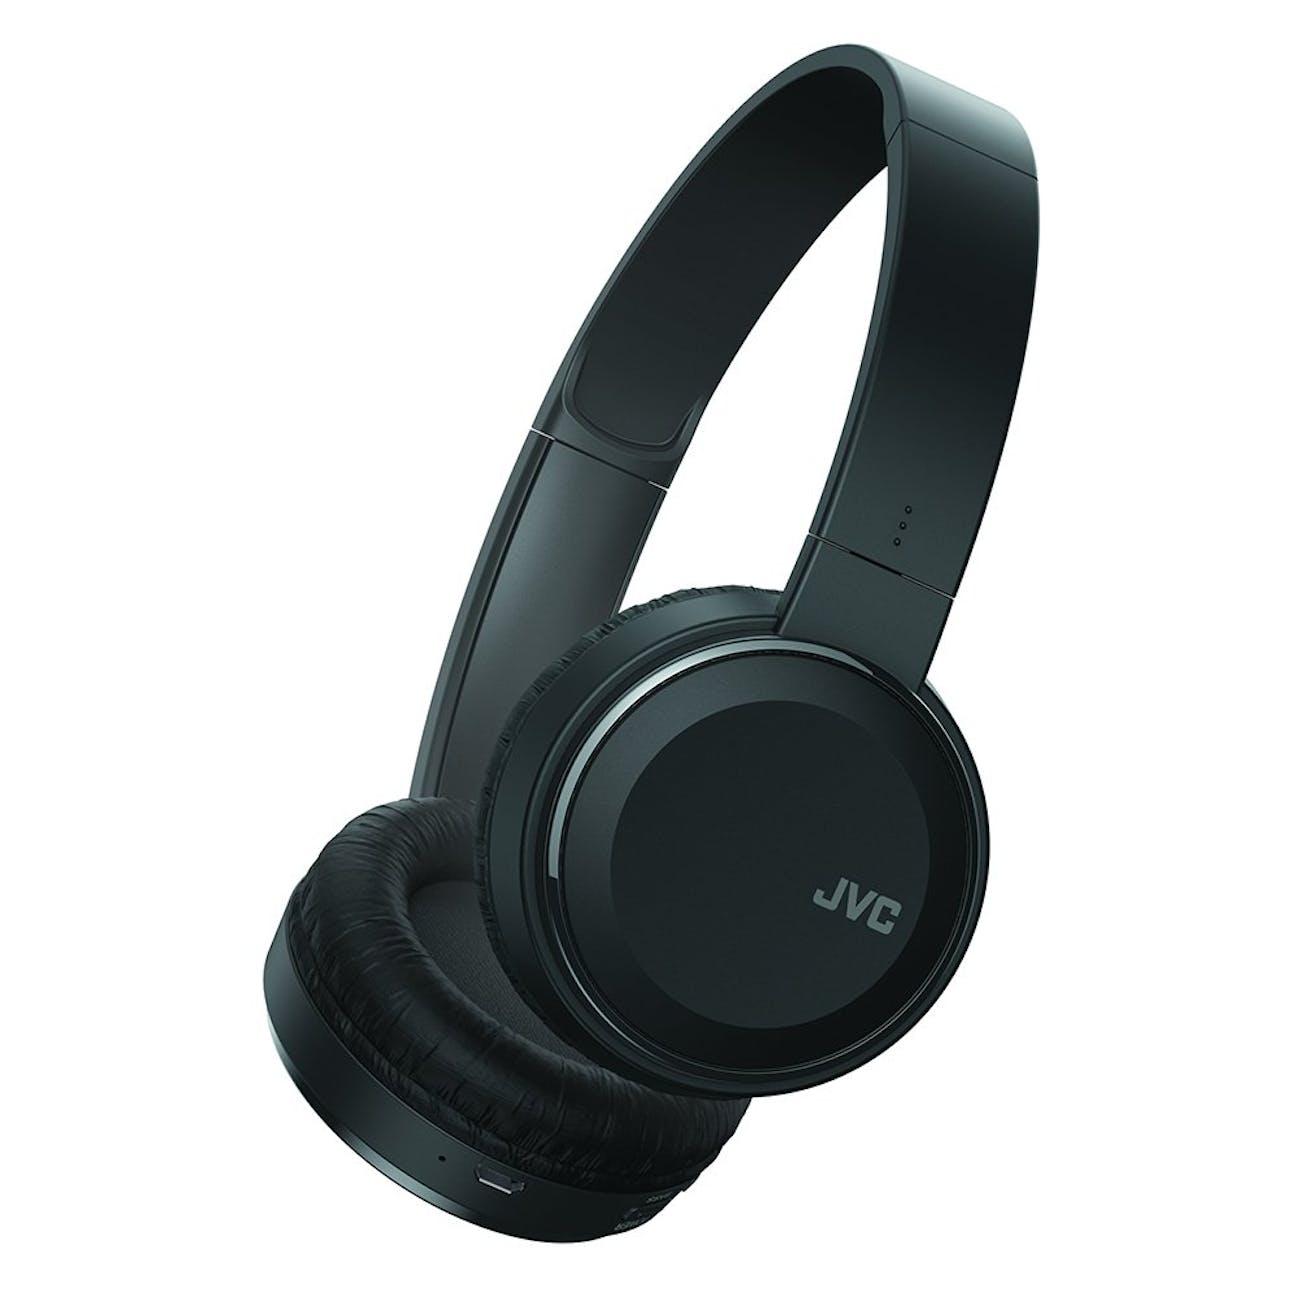 JVC Wireless Lightweight Flat Foldable On Ear Bluetooth Wireless Headband with Mic, Black (HAS190BTB)